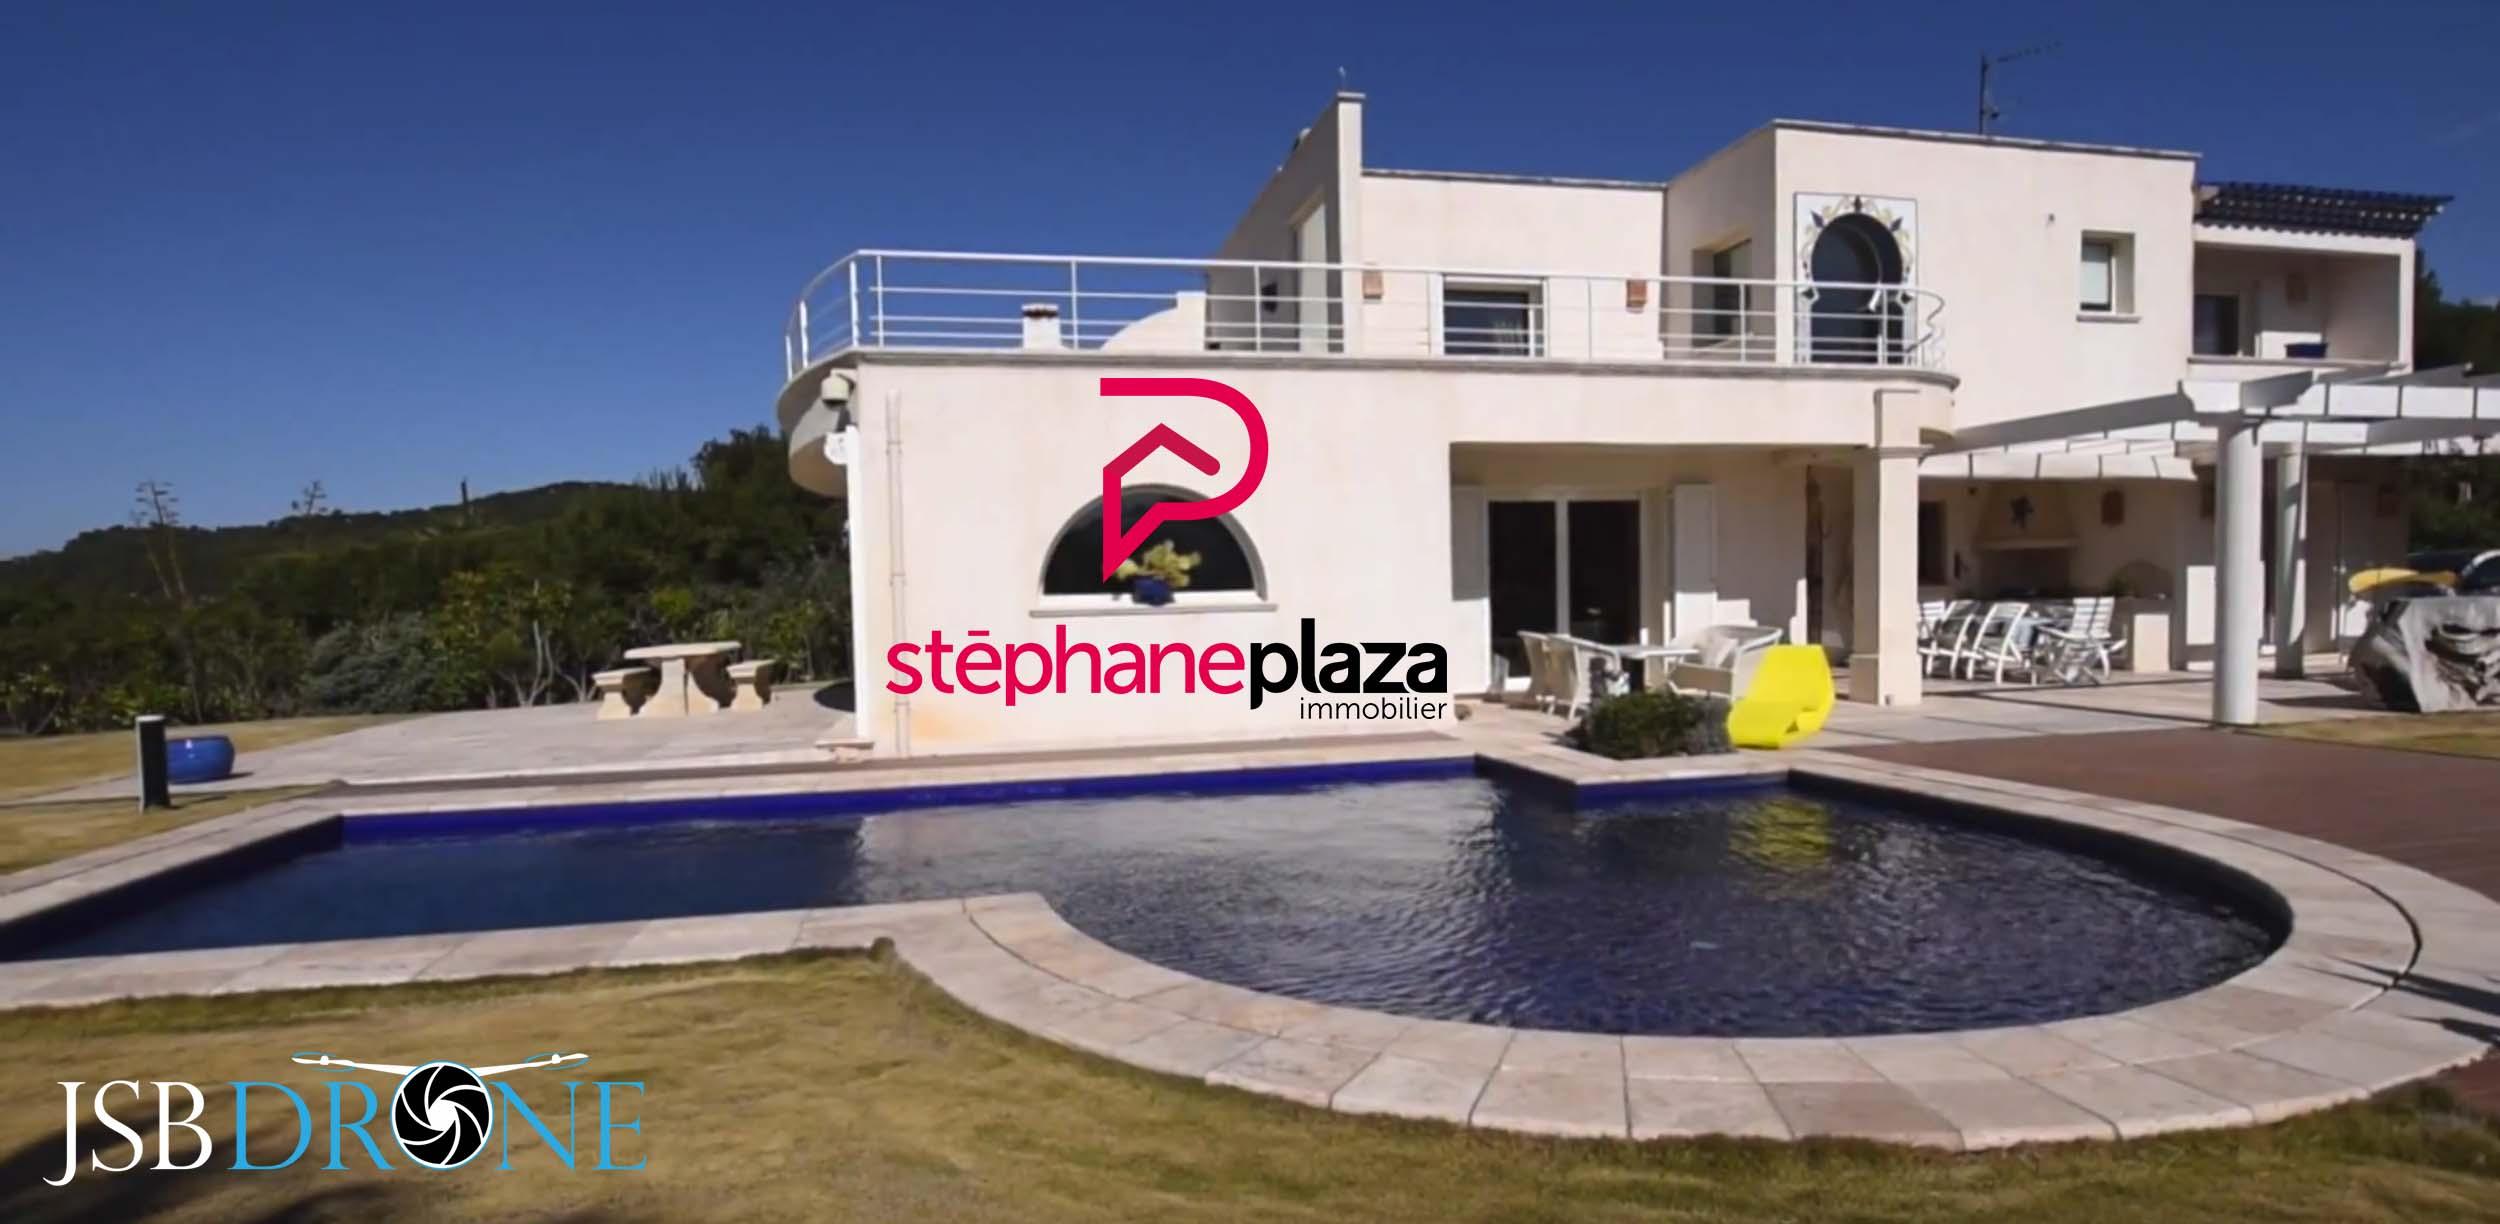 Stephane plaza immobilier maison vue drone